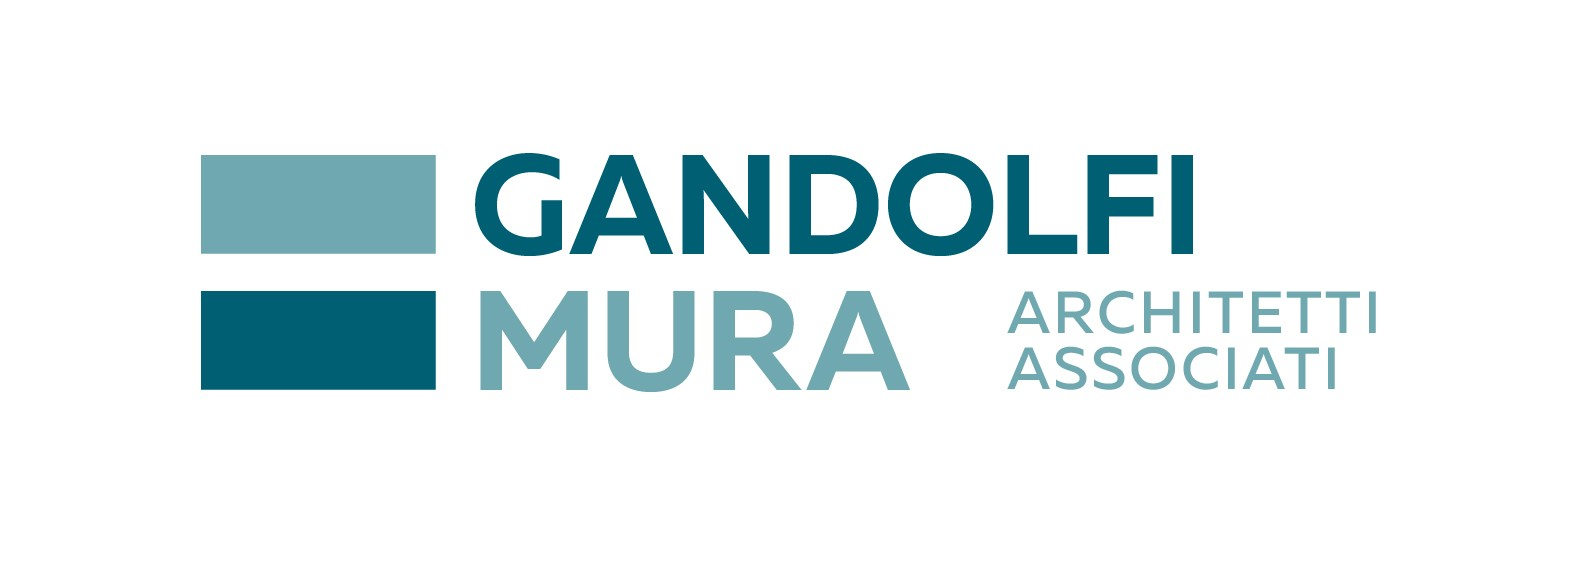 Offerte Lavoro Architetto Bergamo gandolfi e mura architetti associati   linkedin